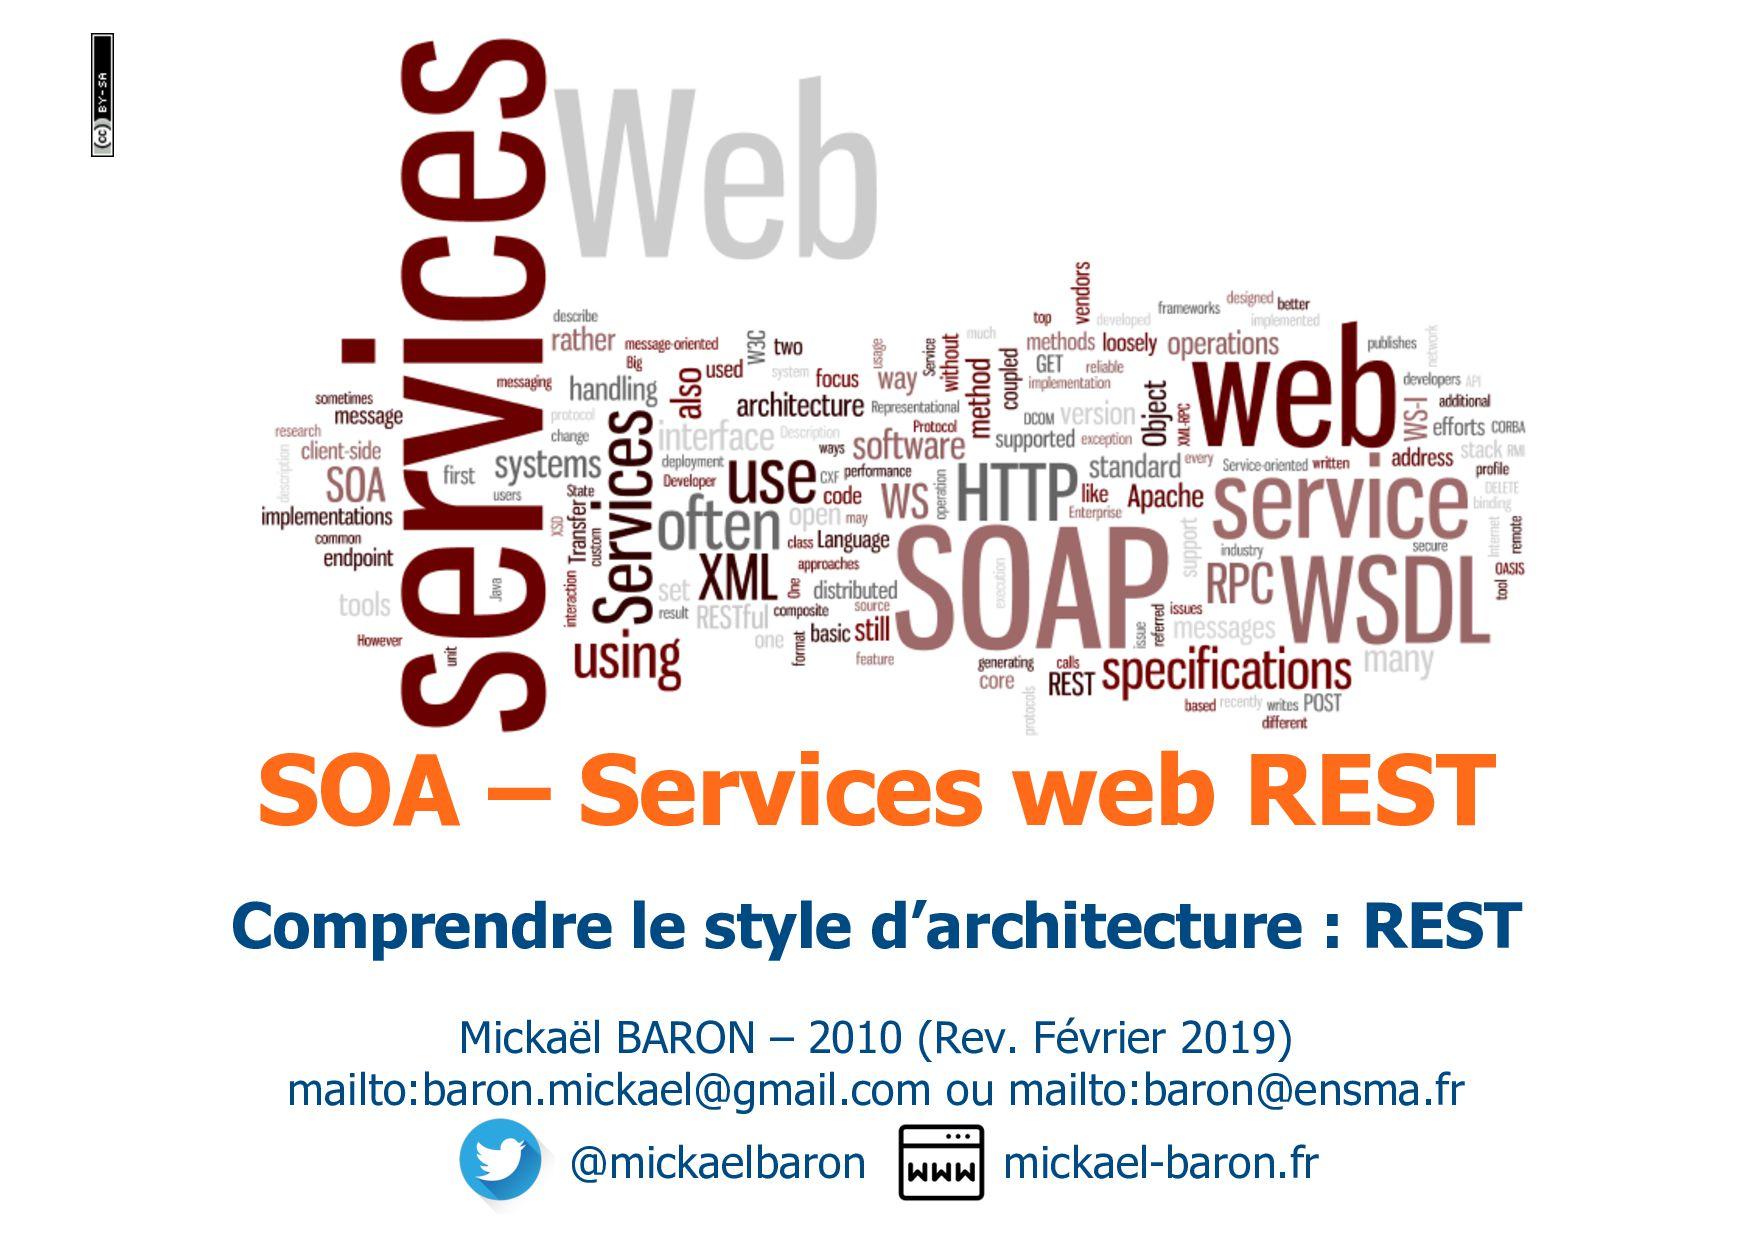 SOA – Services web REST Mickaël BARON – 2010 (R...